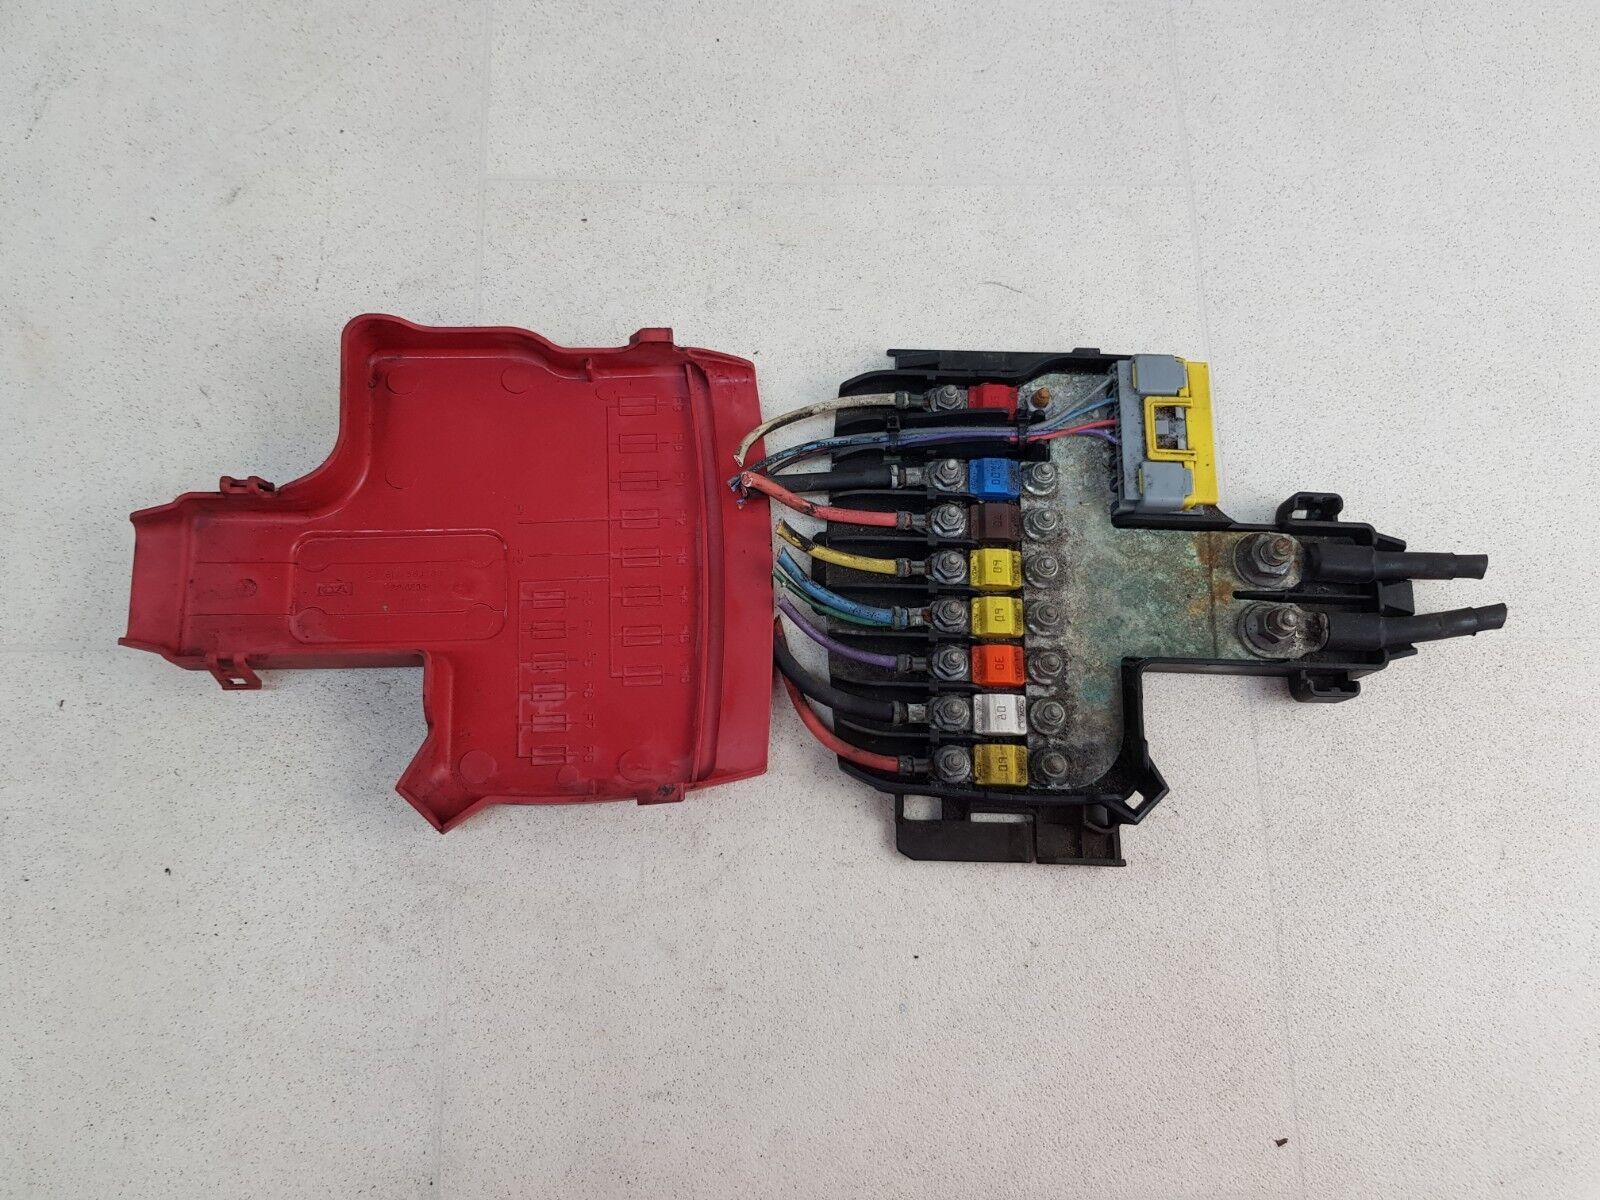 details about citroen c4 picasso mk1 07 13 engine battery fuse box unit with cover 9662914480 [ 1600 x 1200 Pixel ]